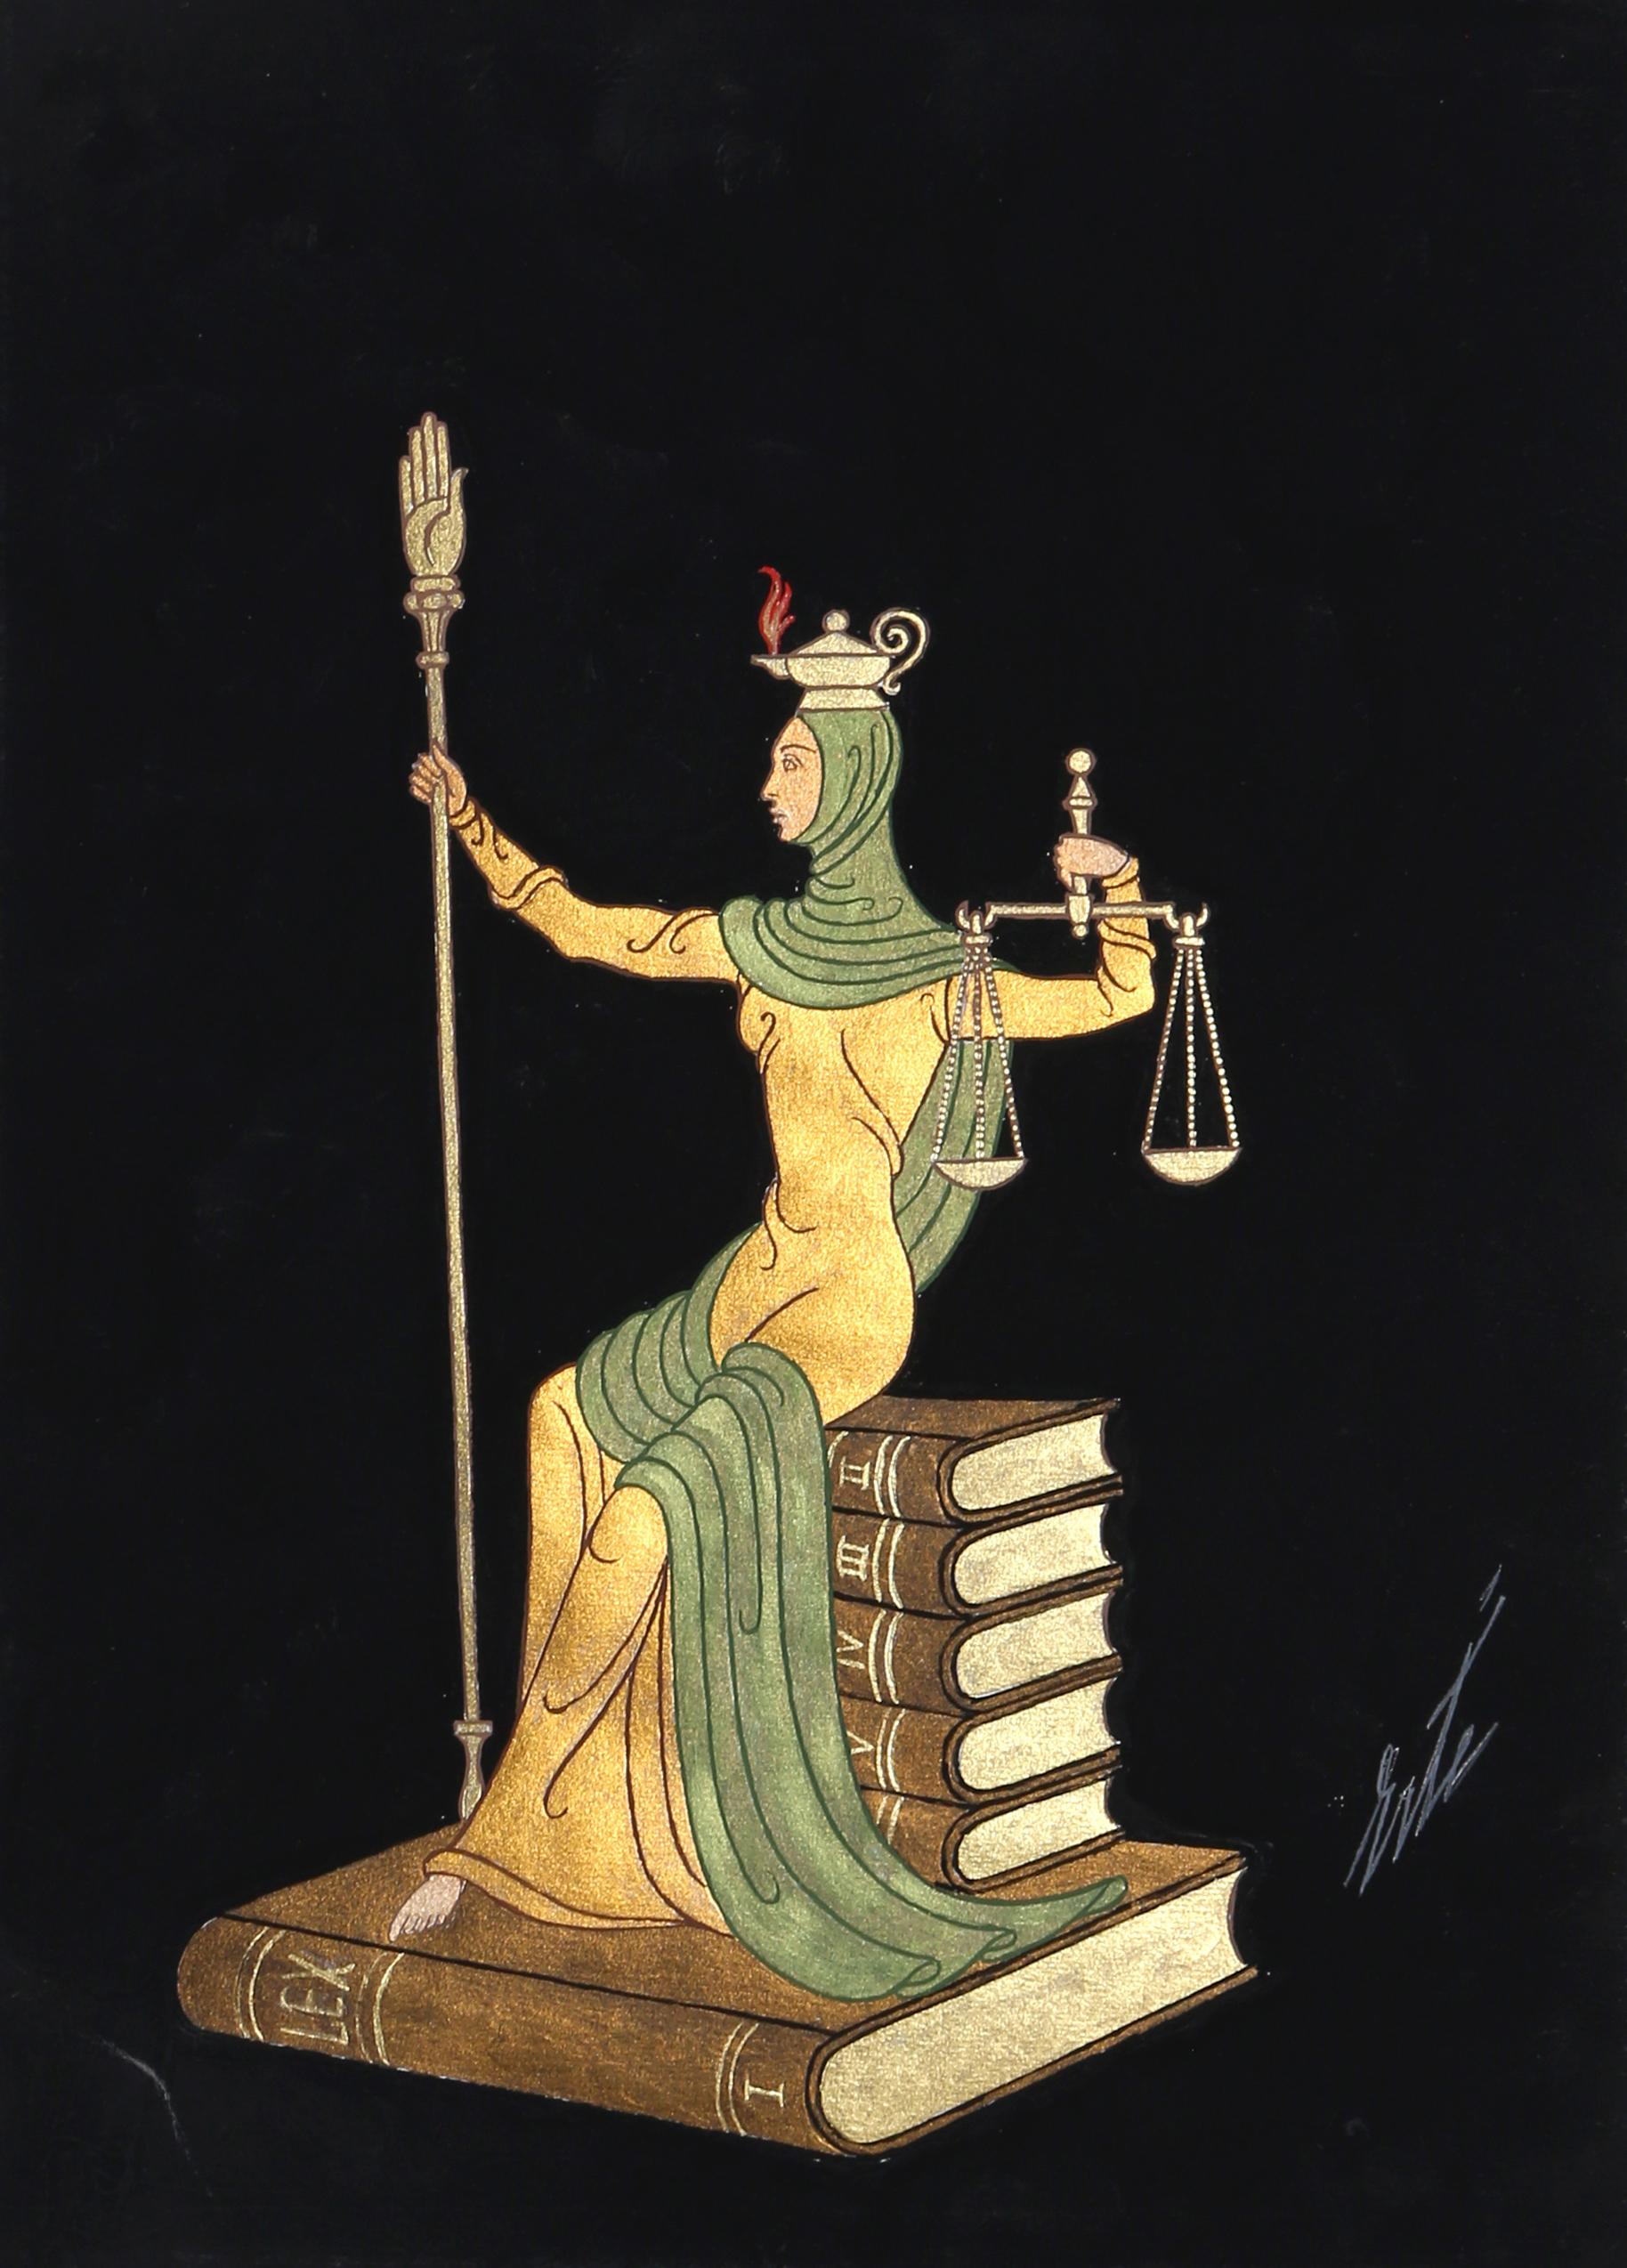 Lady Justice, Art Deco Gouache Painting by Erte